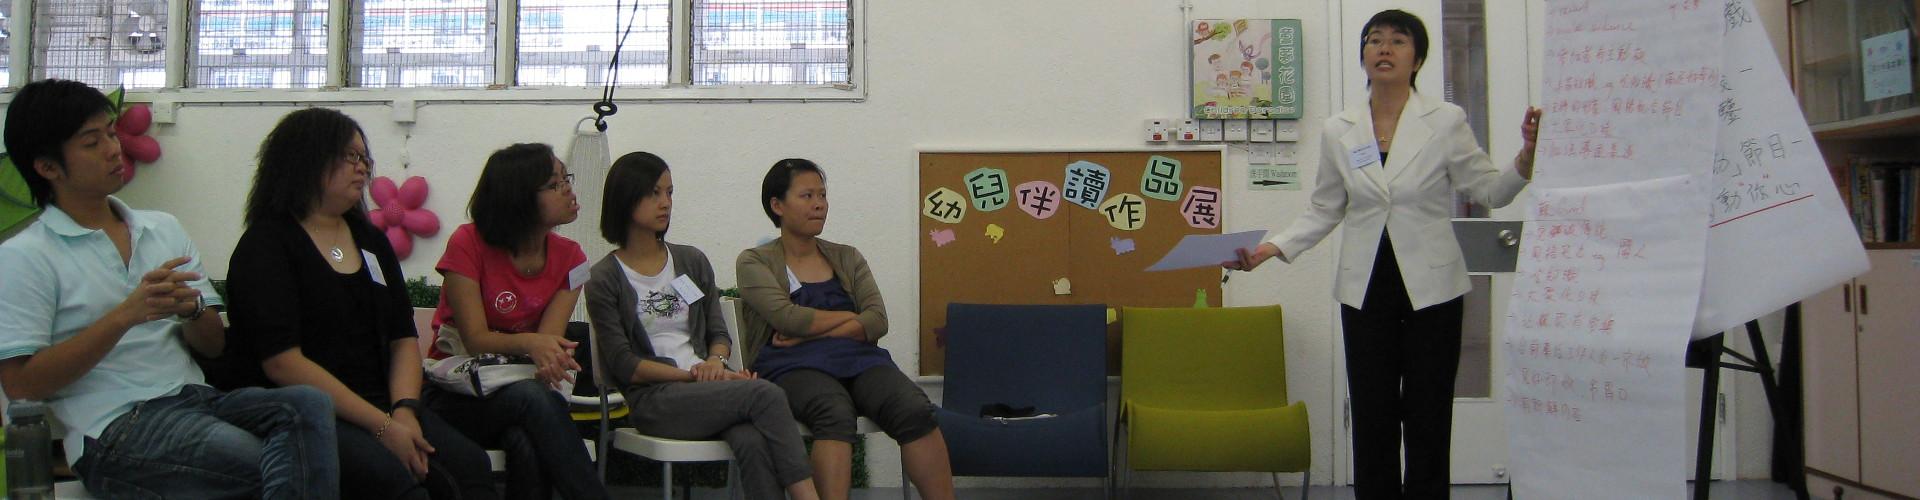 Classroom discussion / 課堂討論 / 课堂讨论